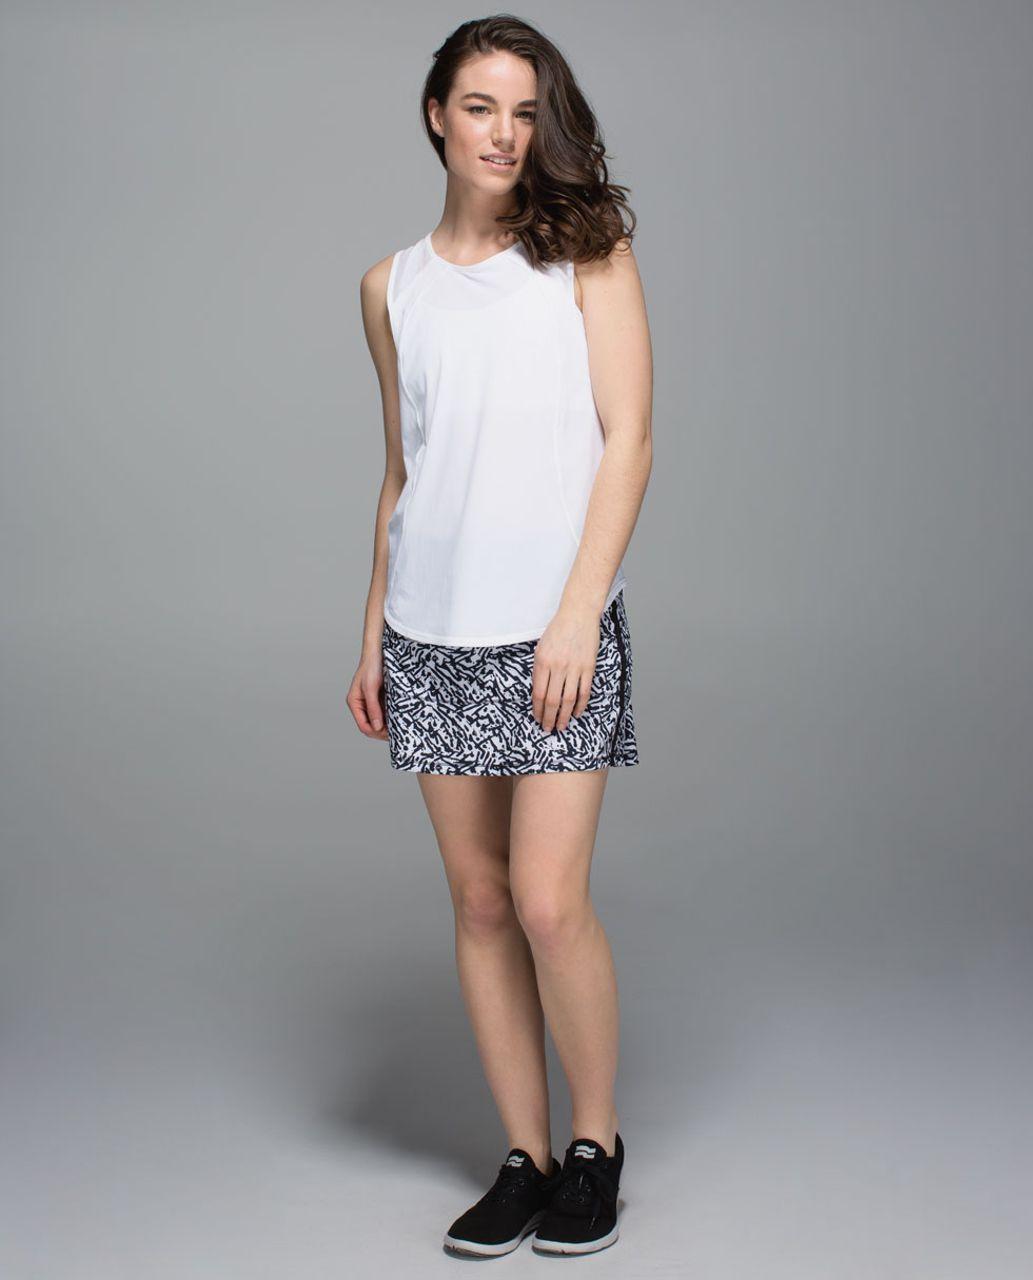 Lululemon Pace Rival Skirt II *4-way Stretch (Tall) - Brushed Animal White Black / Black